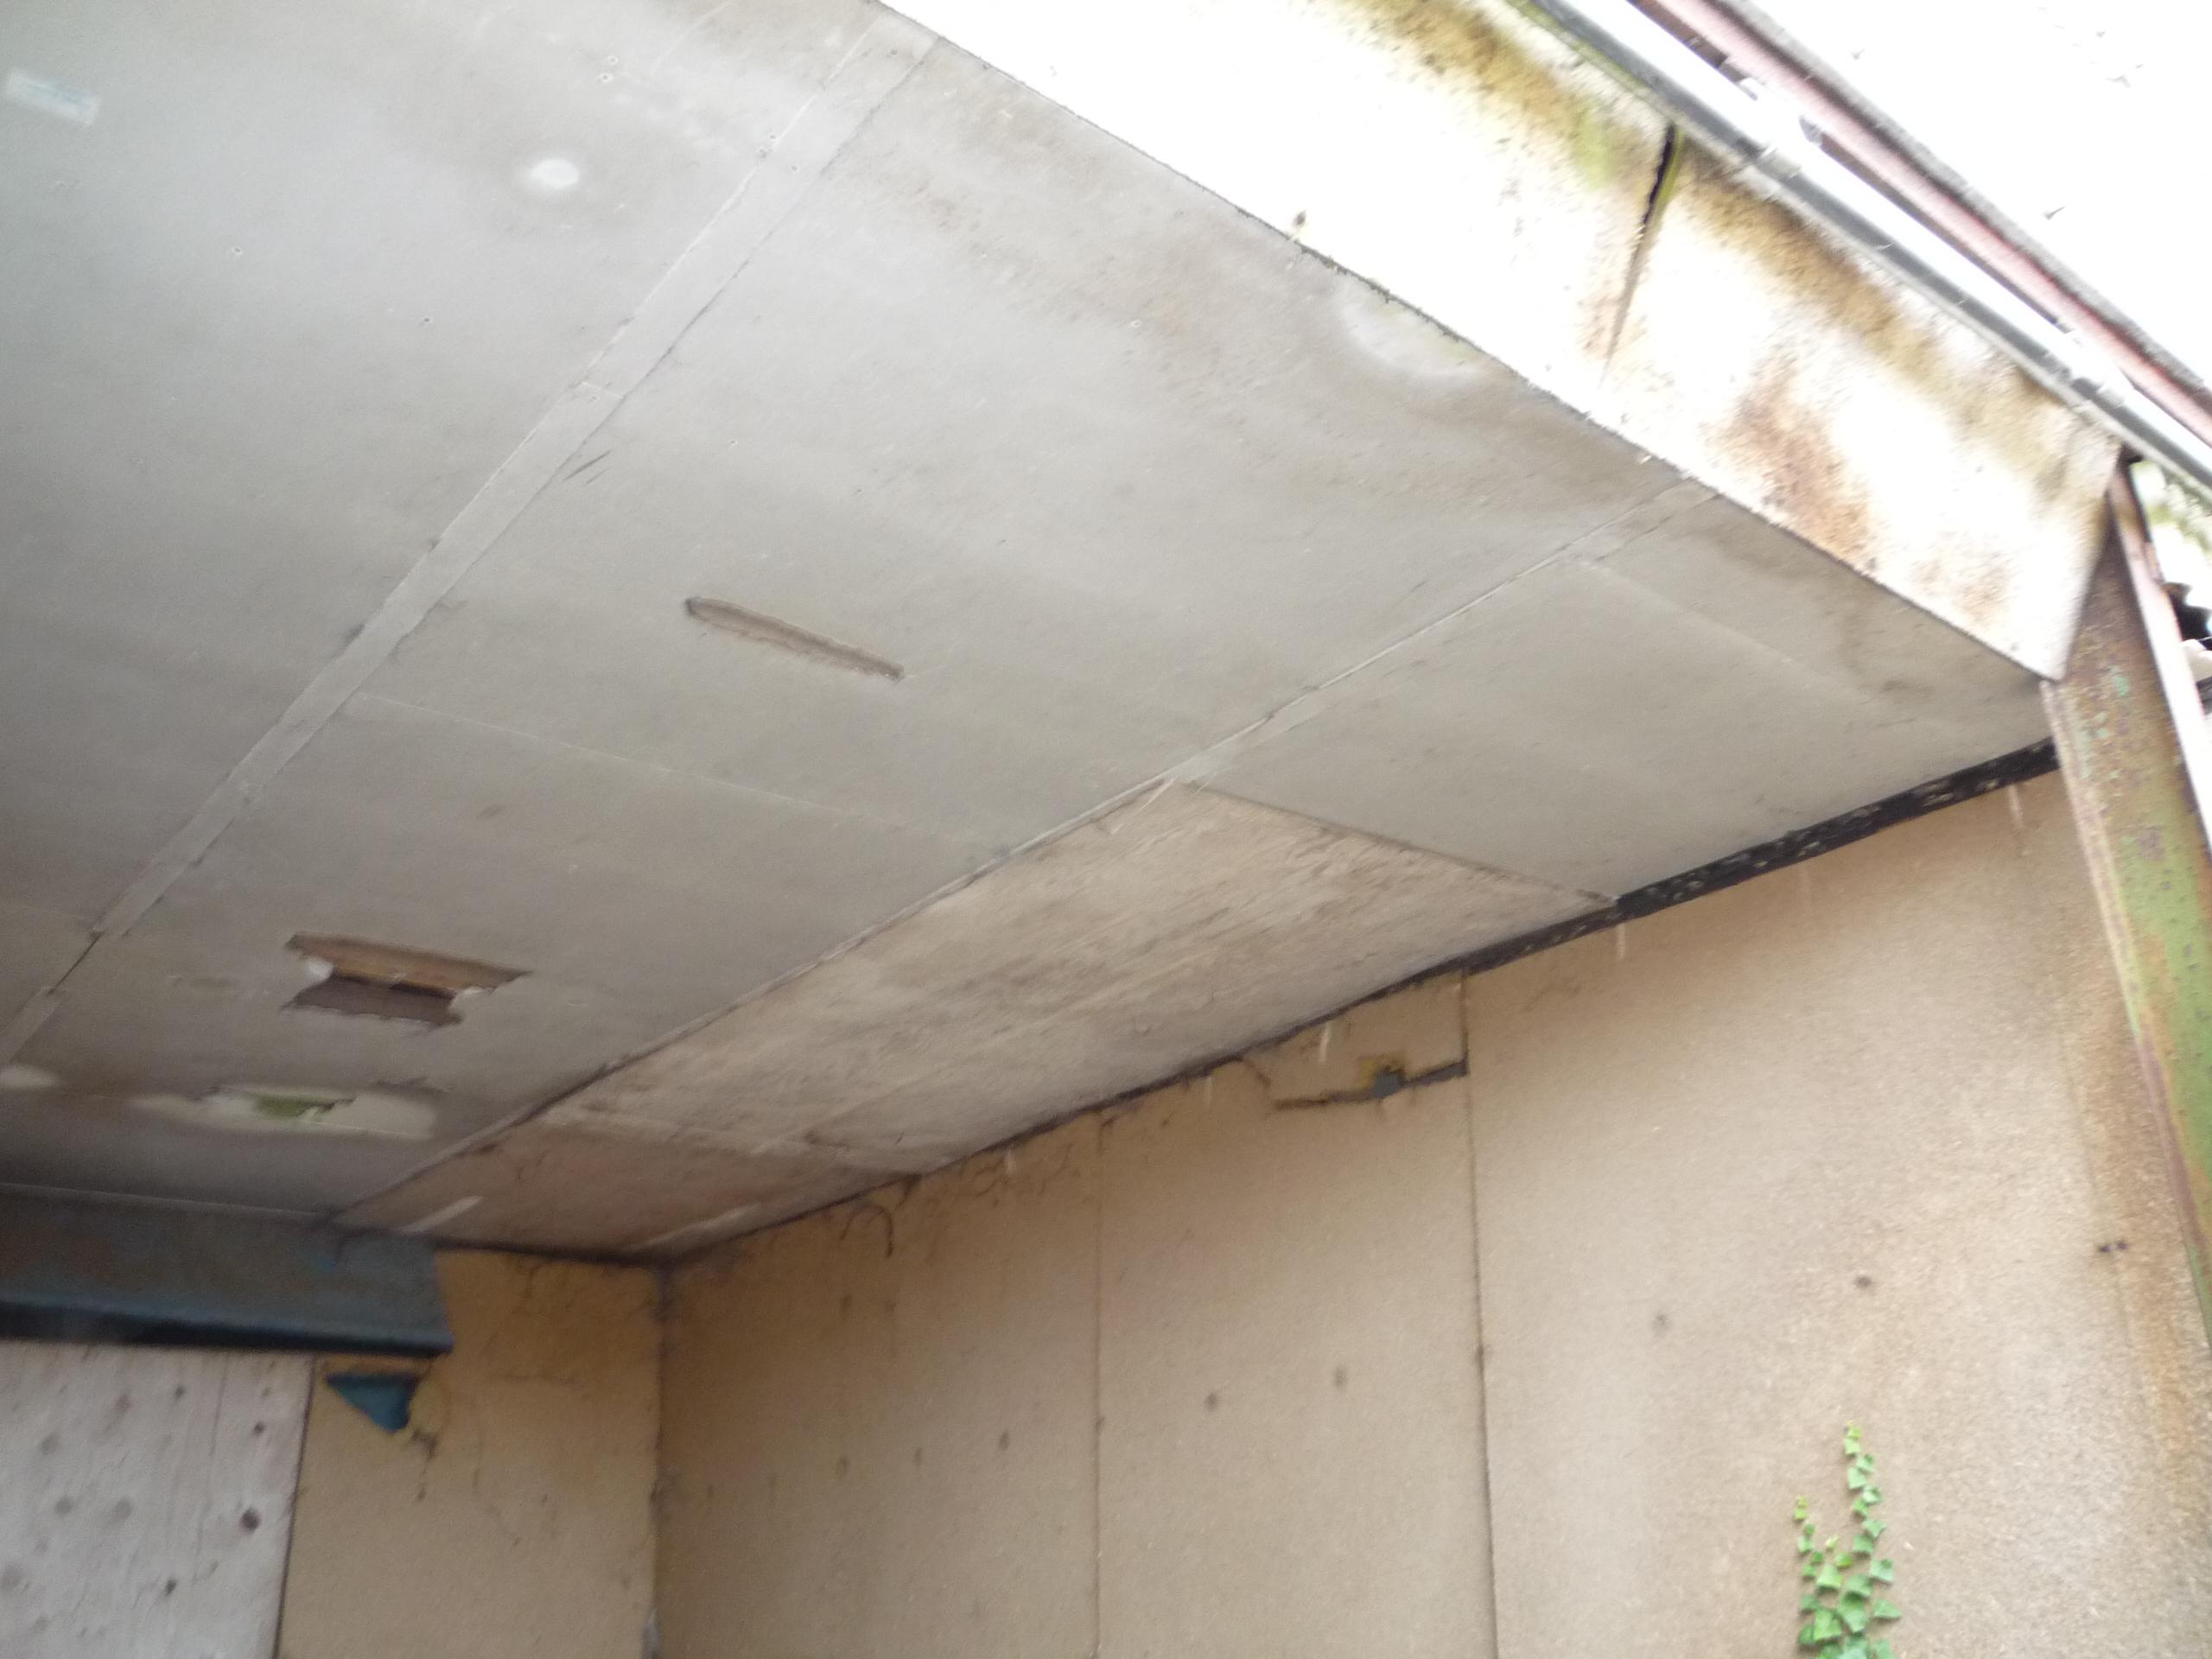 Asbestos insulating board ceiling